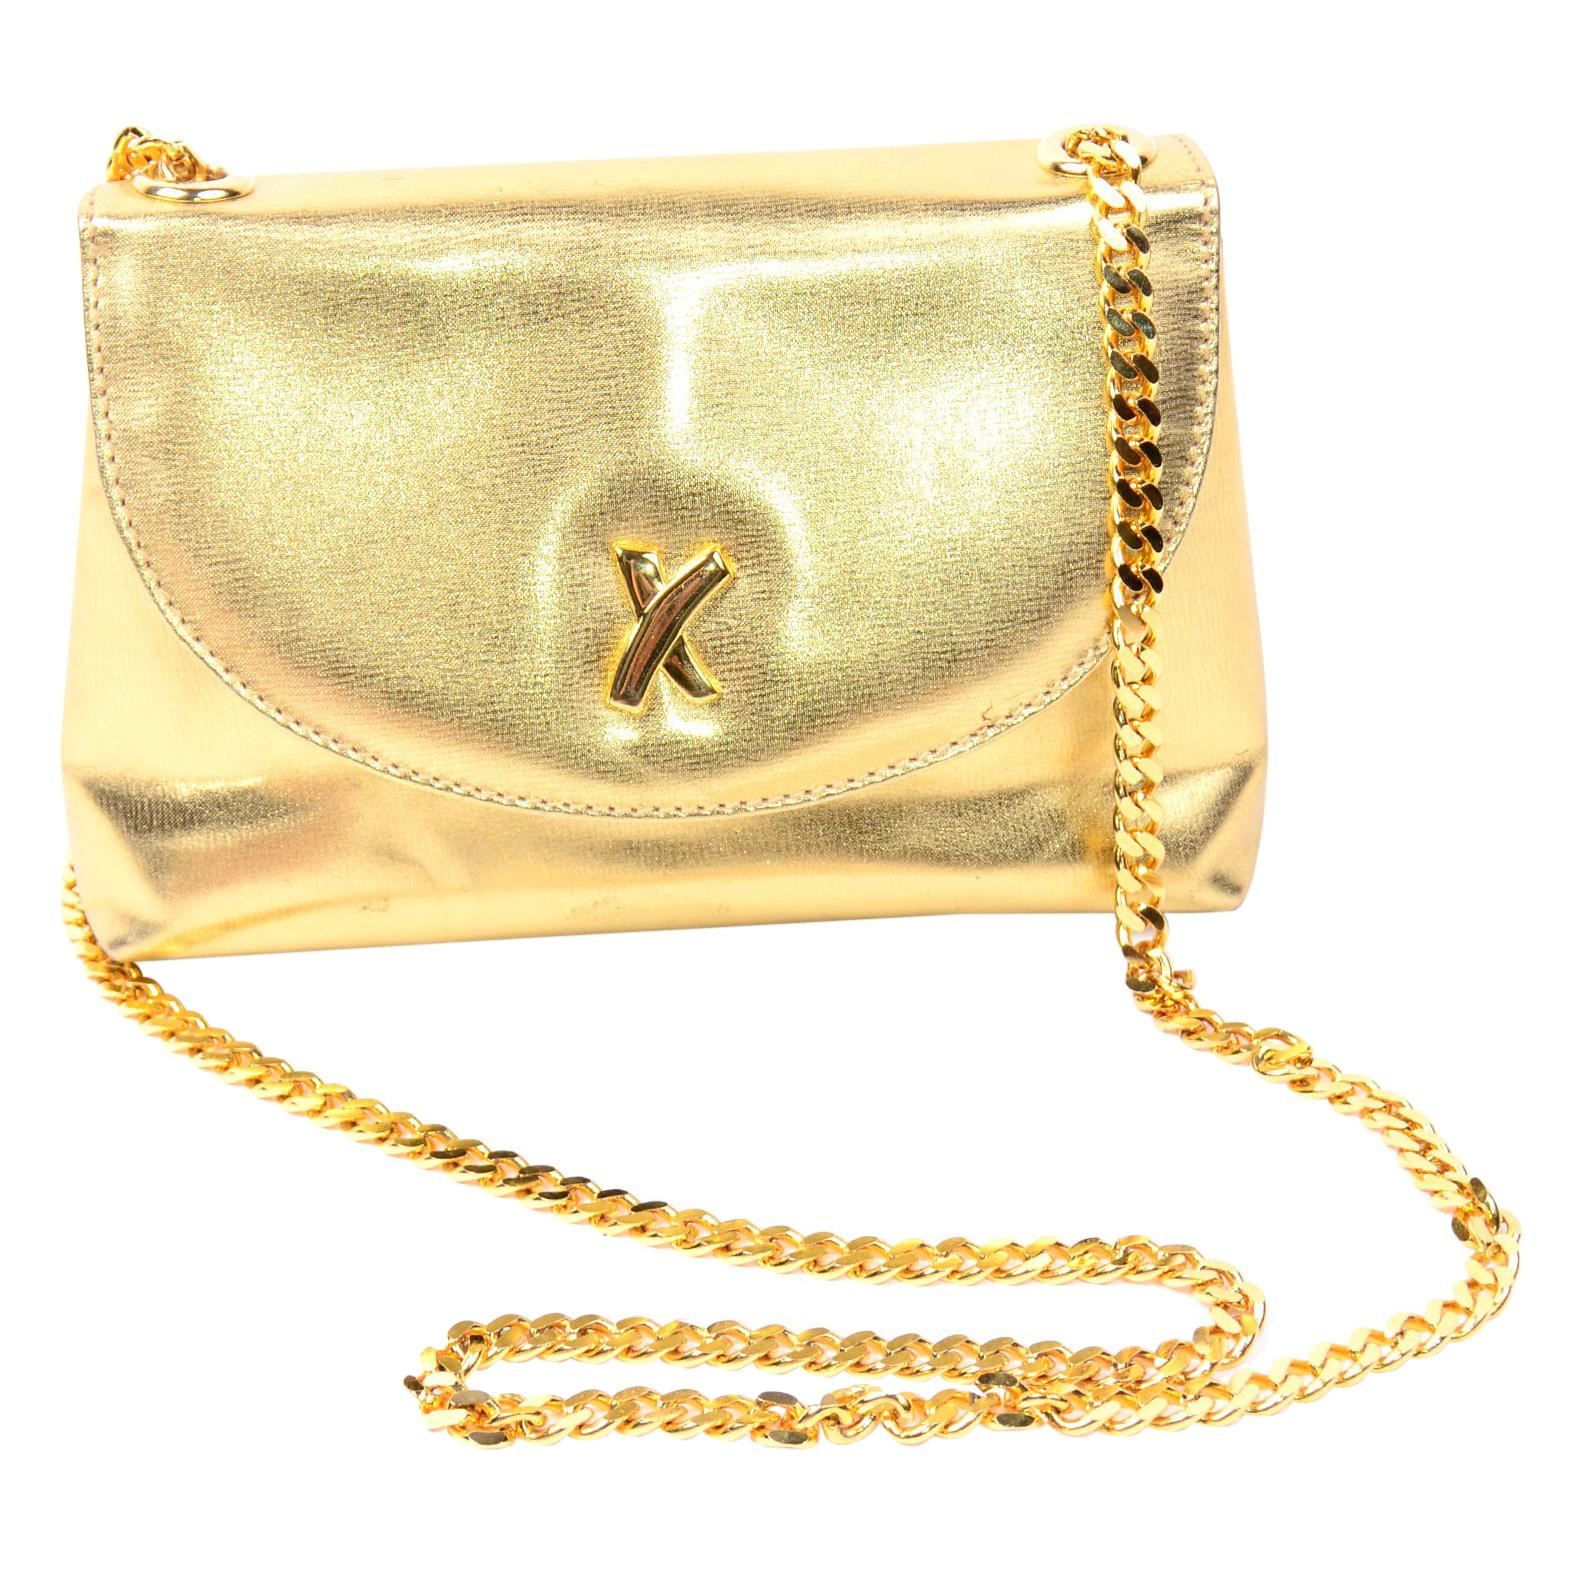 Paloma Picasso Gold Signature X Shoulder Bag With Original Dust Bag